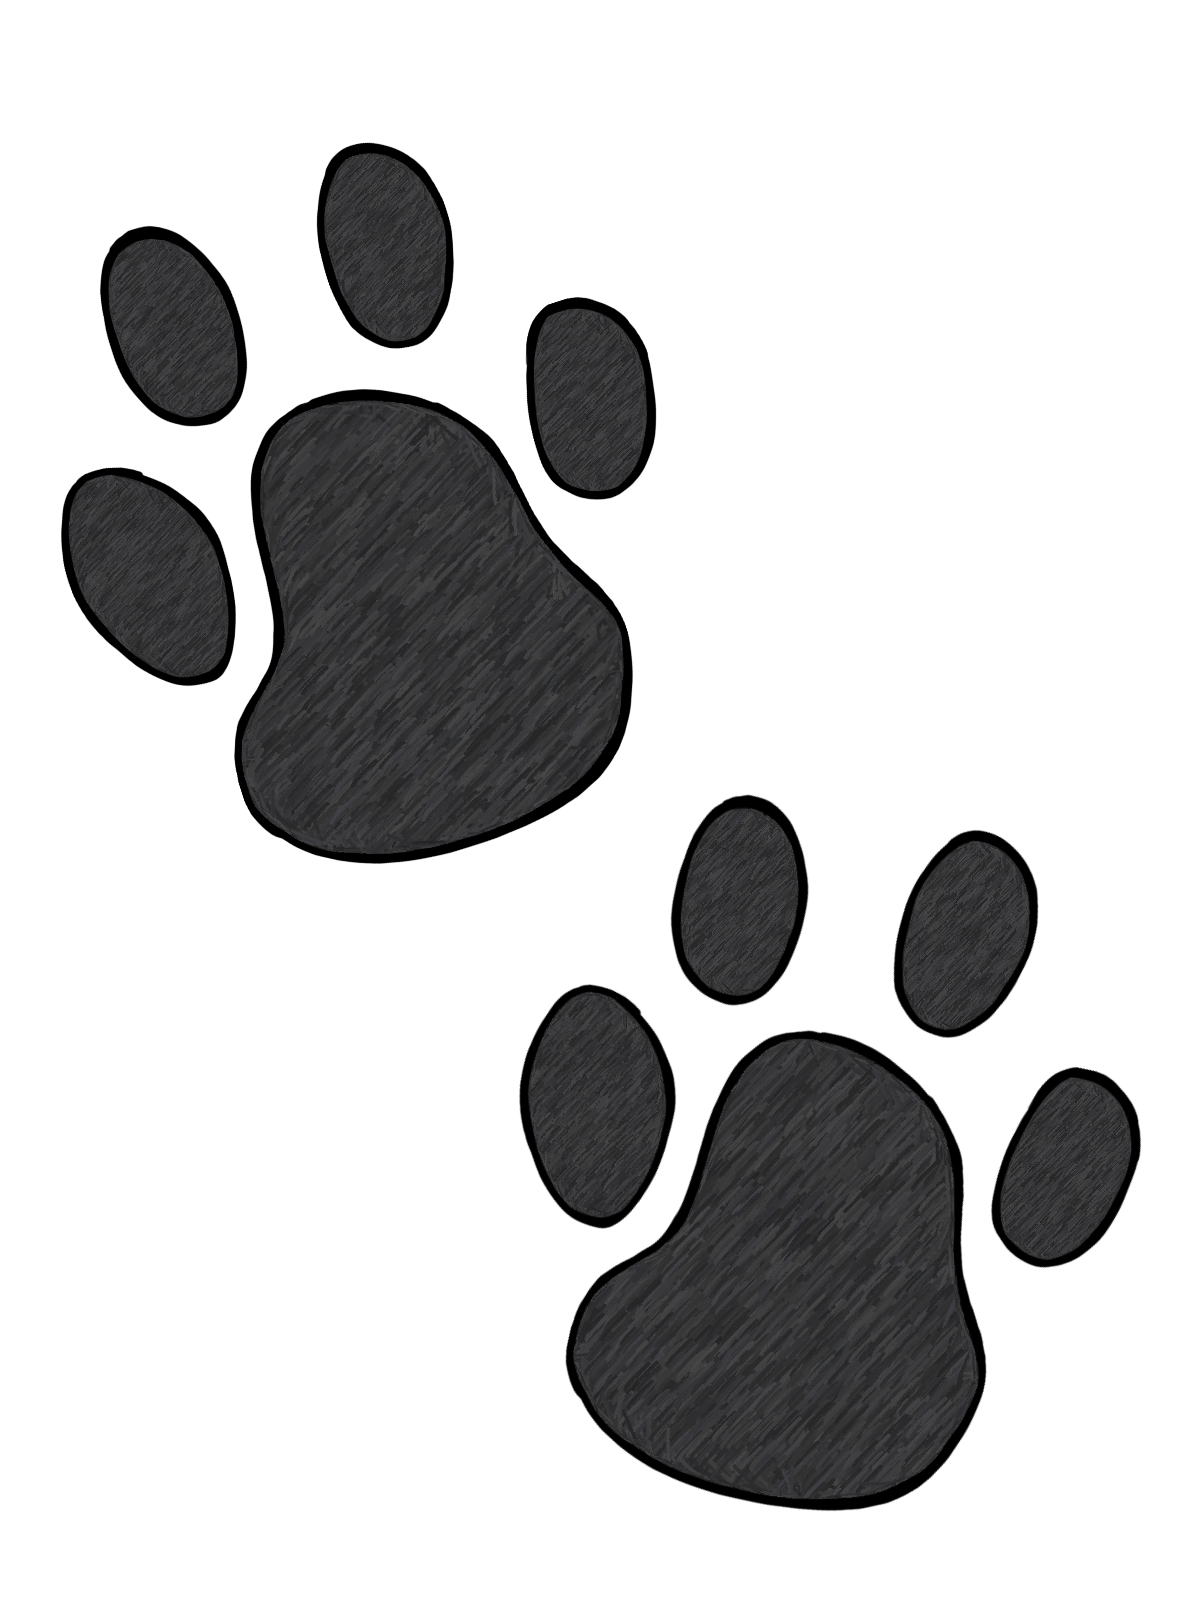 Free Paw Print Images Free, Download Free Clip Art, Free.